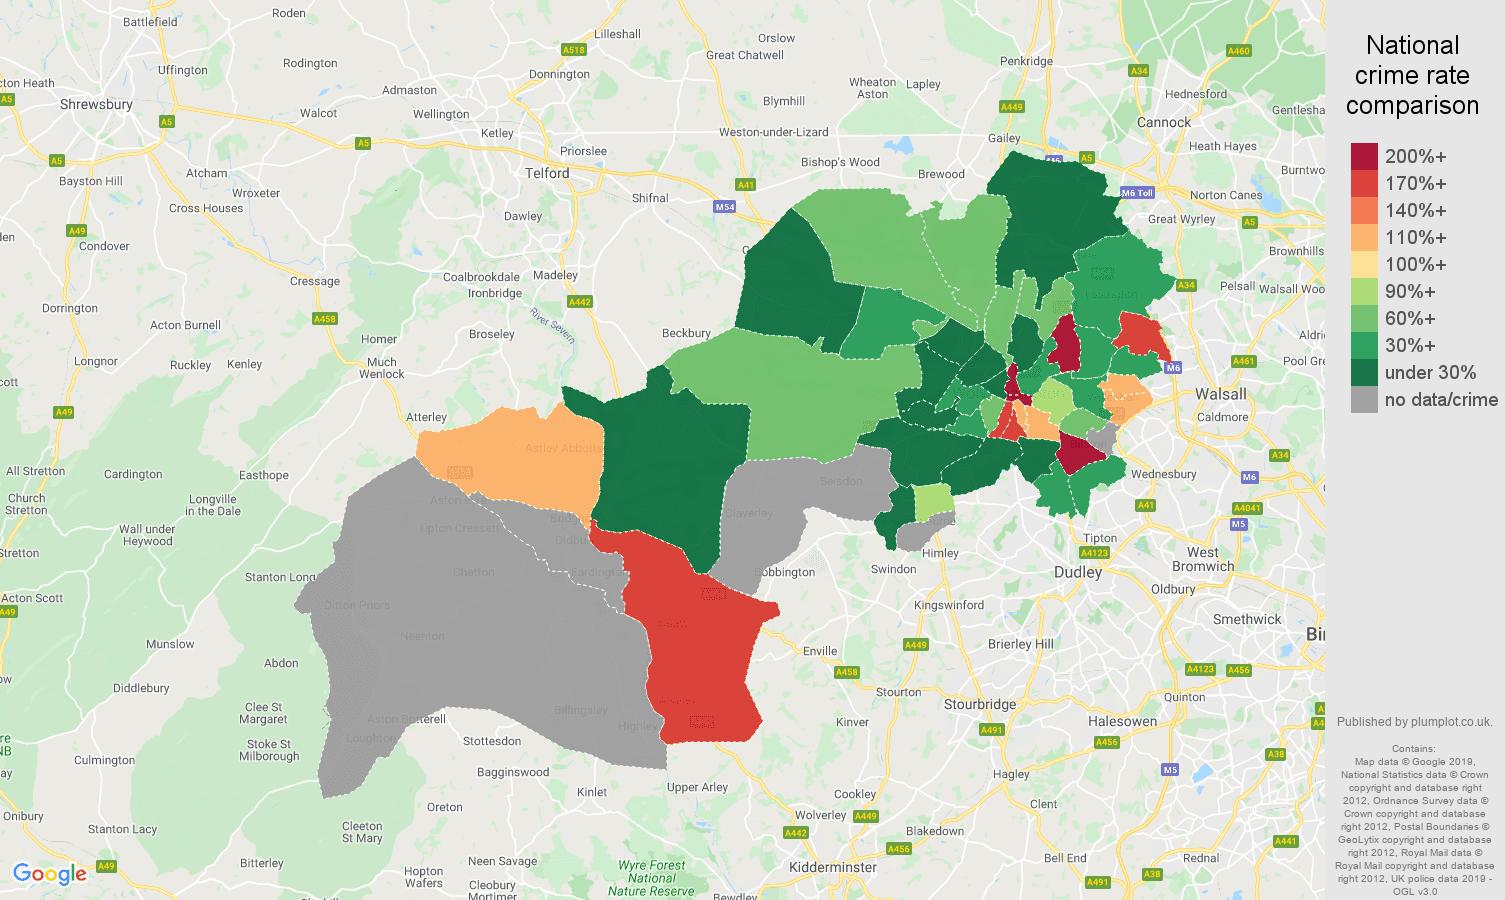 Wolverhampton shoplifting crime rate comparison map